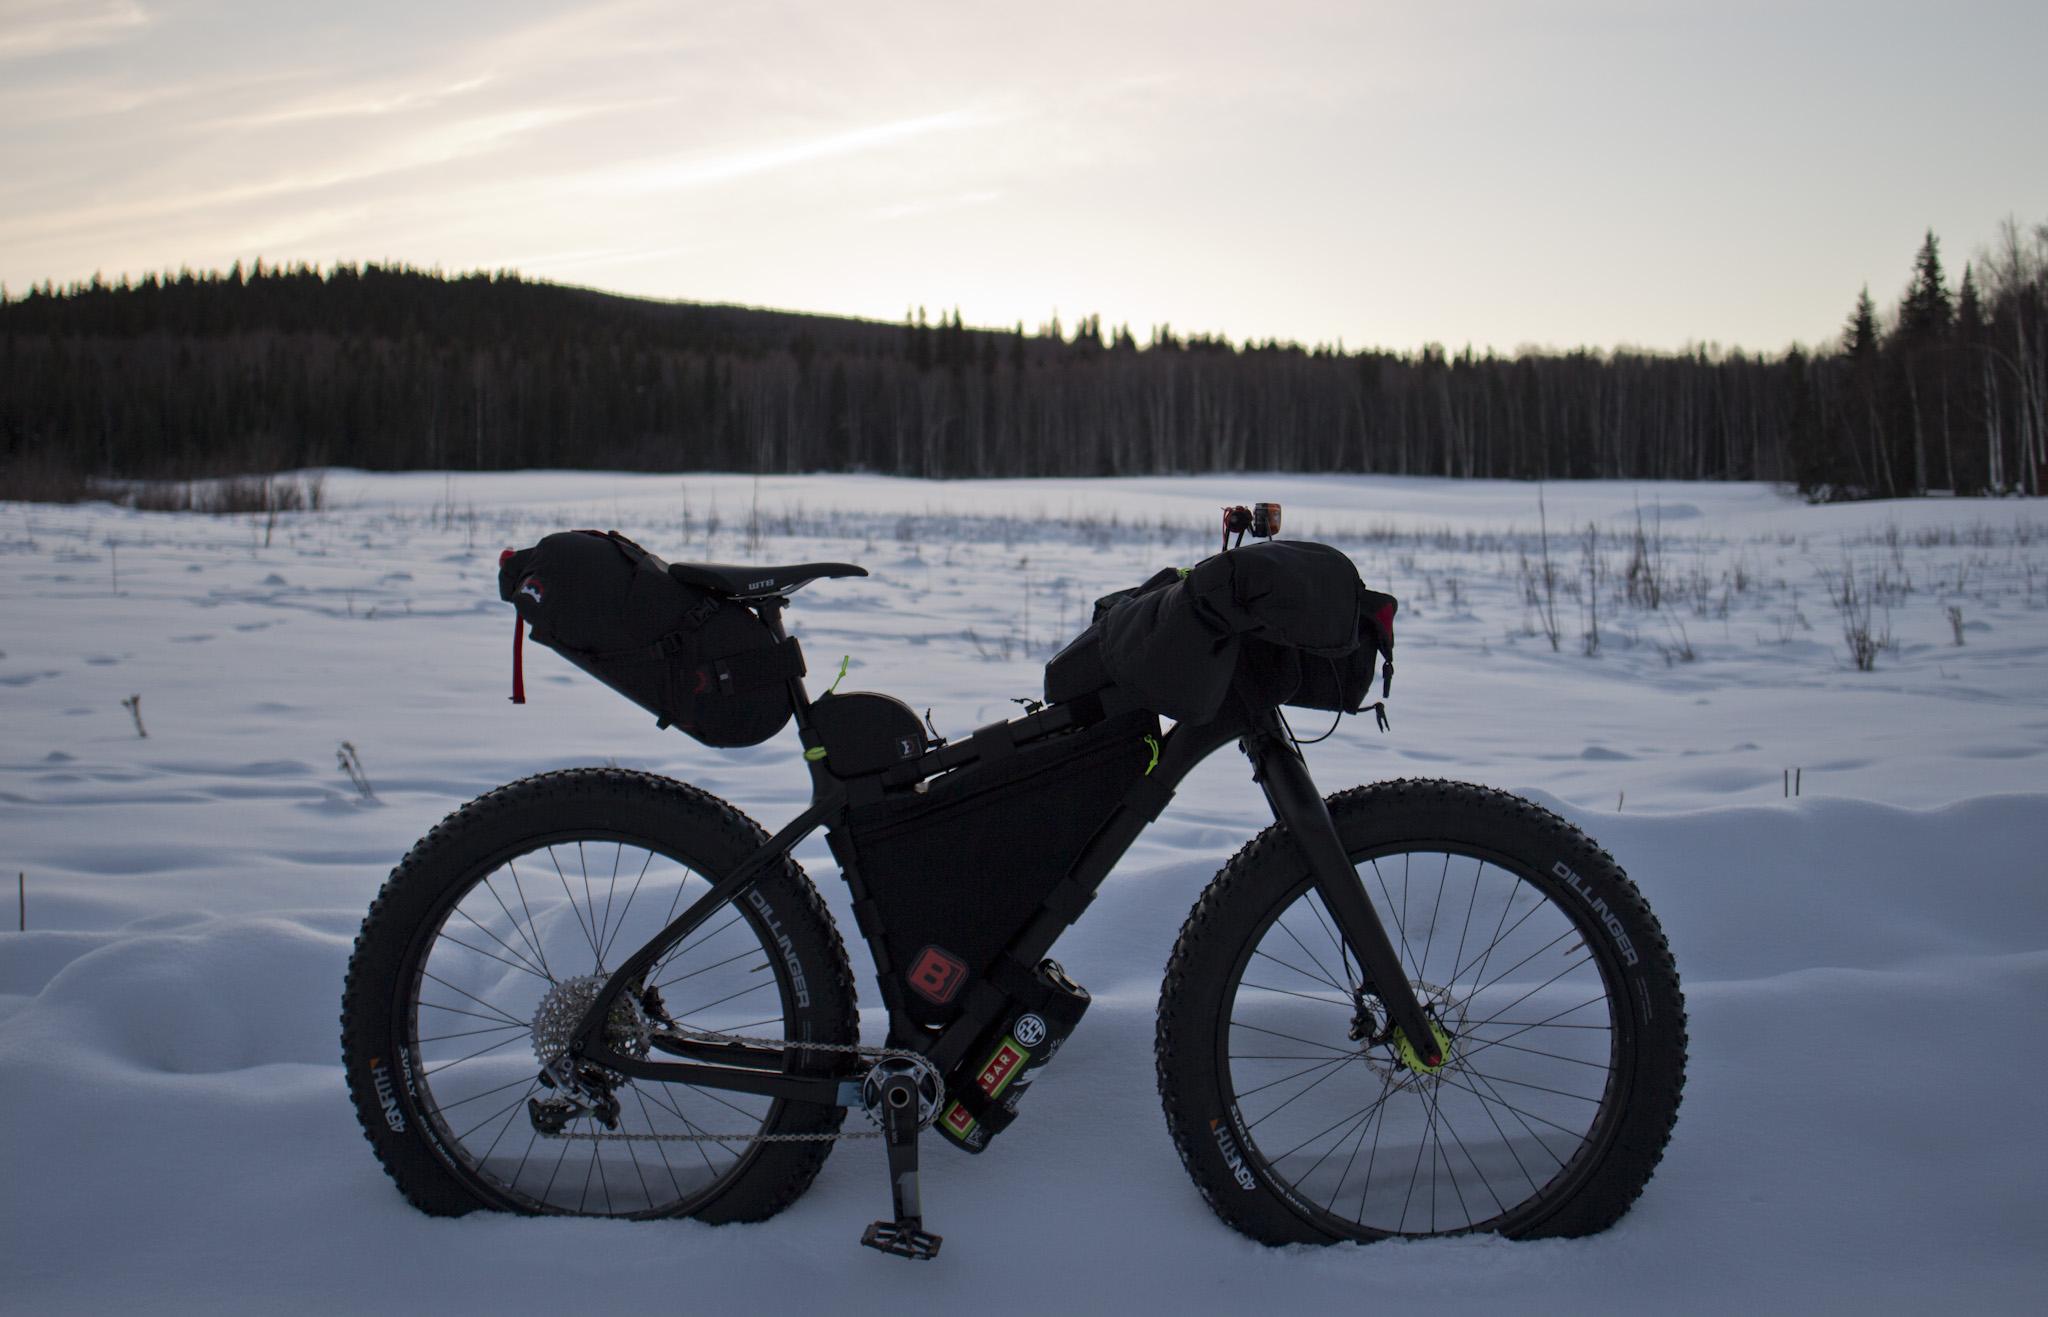 Beargrease enjoying an early evening winter scene. (c) Josh Spice 2014